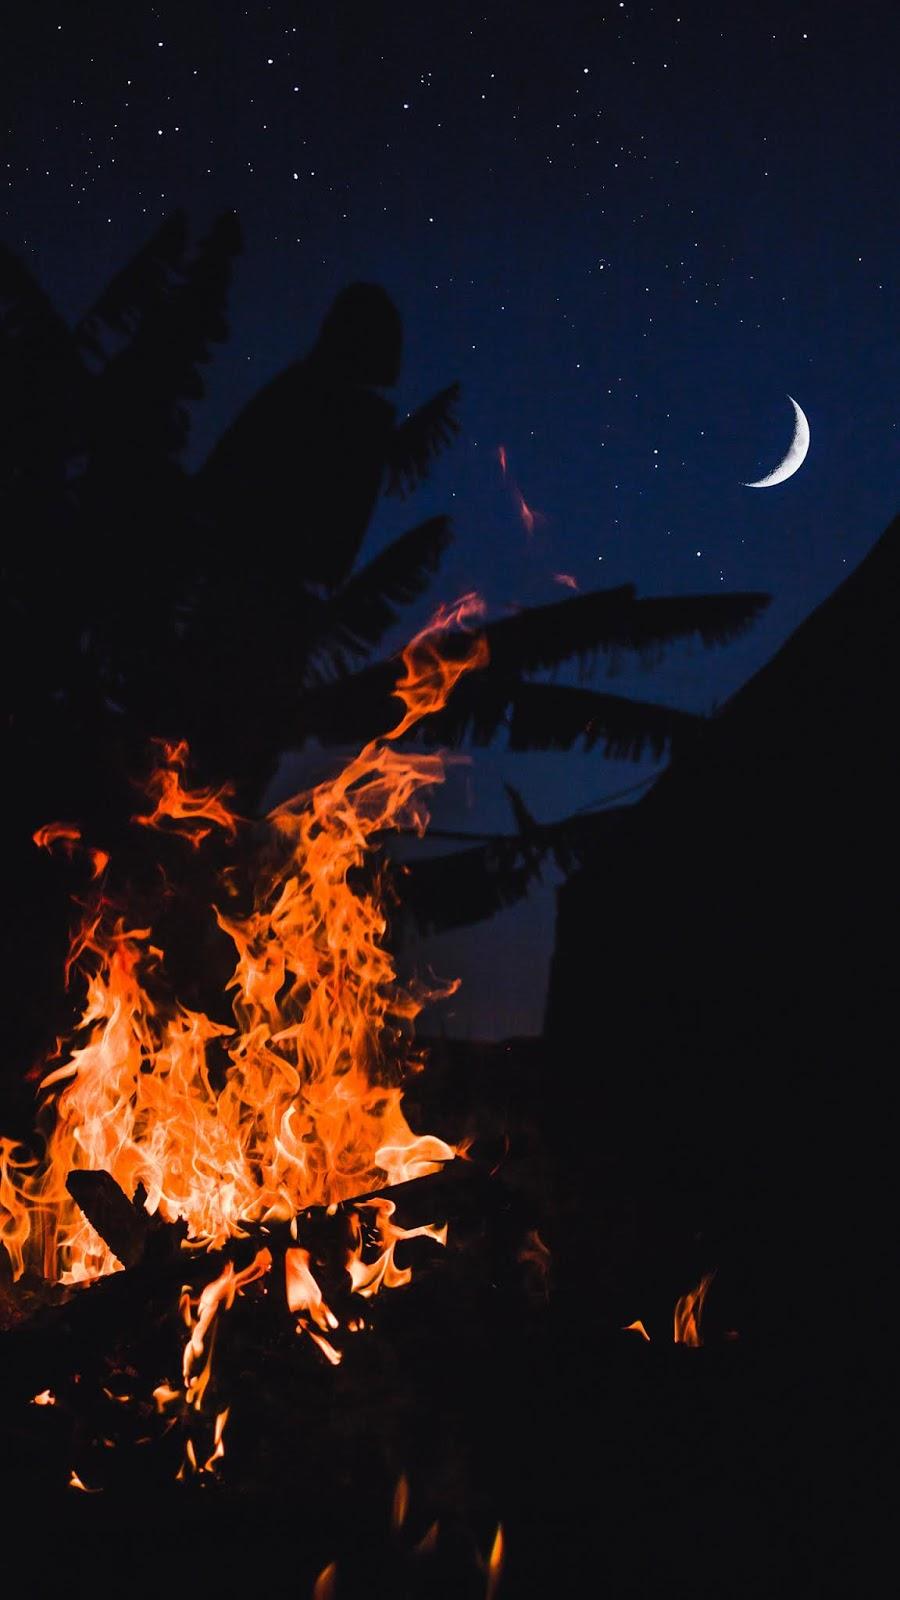 Bonfire in the crescent moon